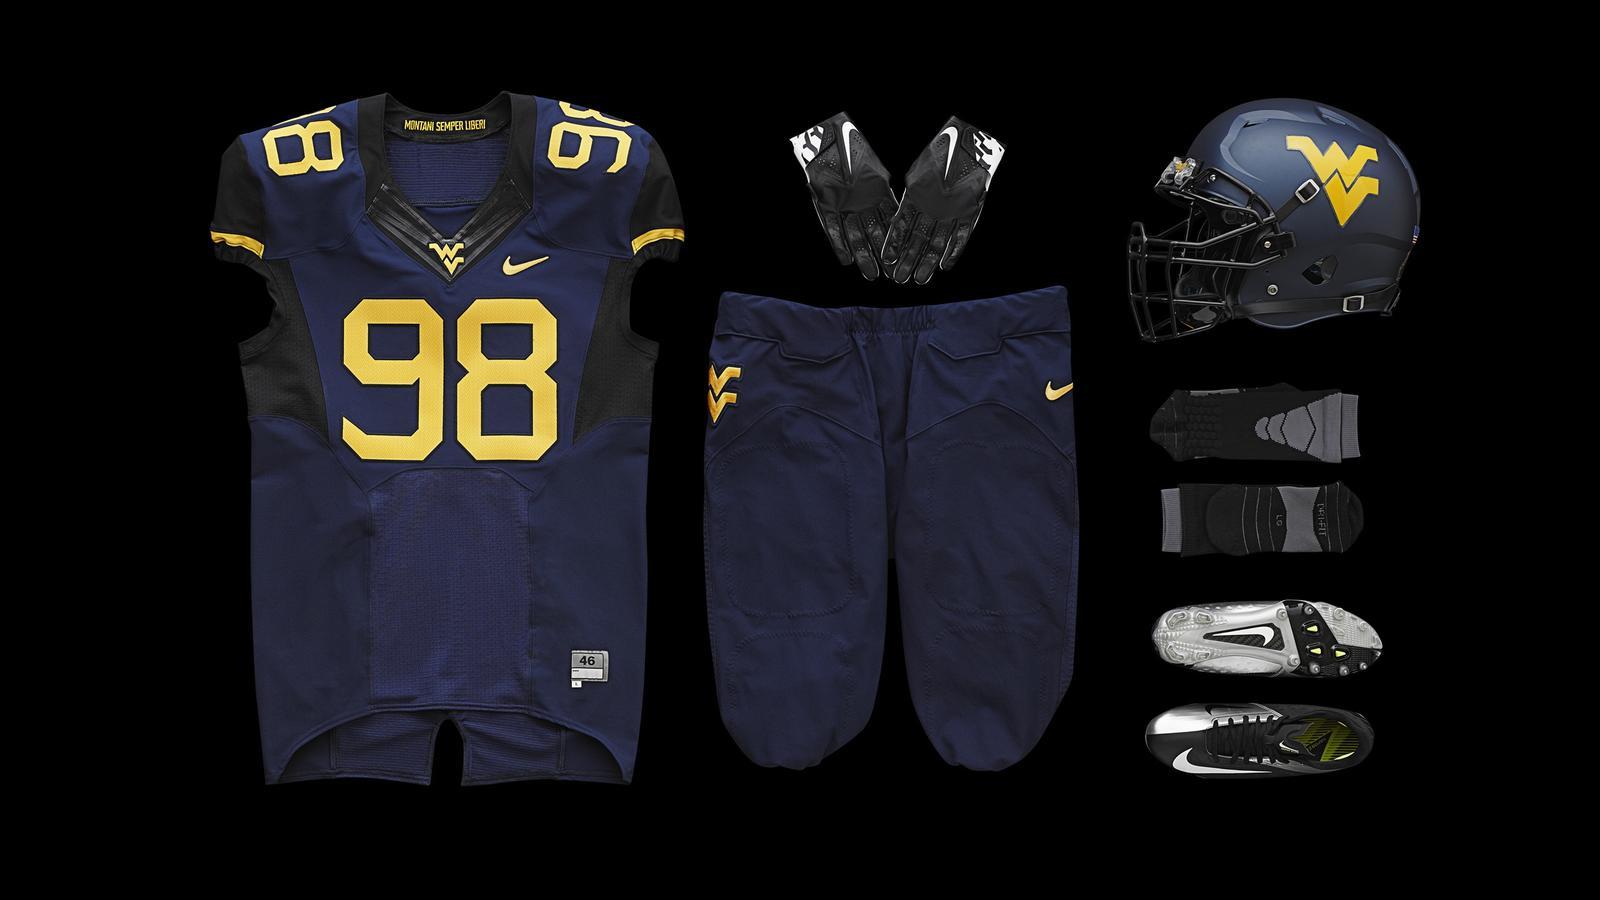 West Virginia Unveils New Football Uniforms For 2013 Season